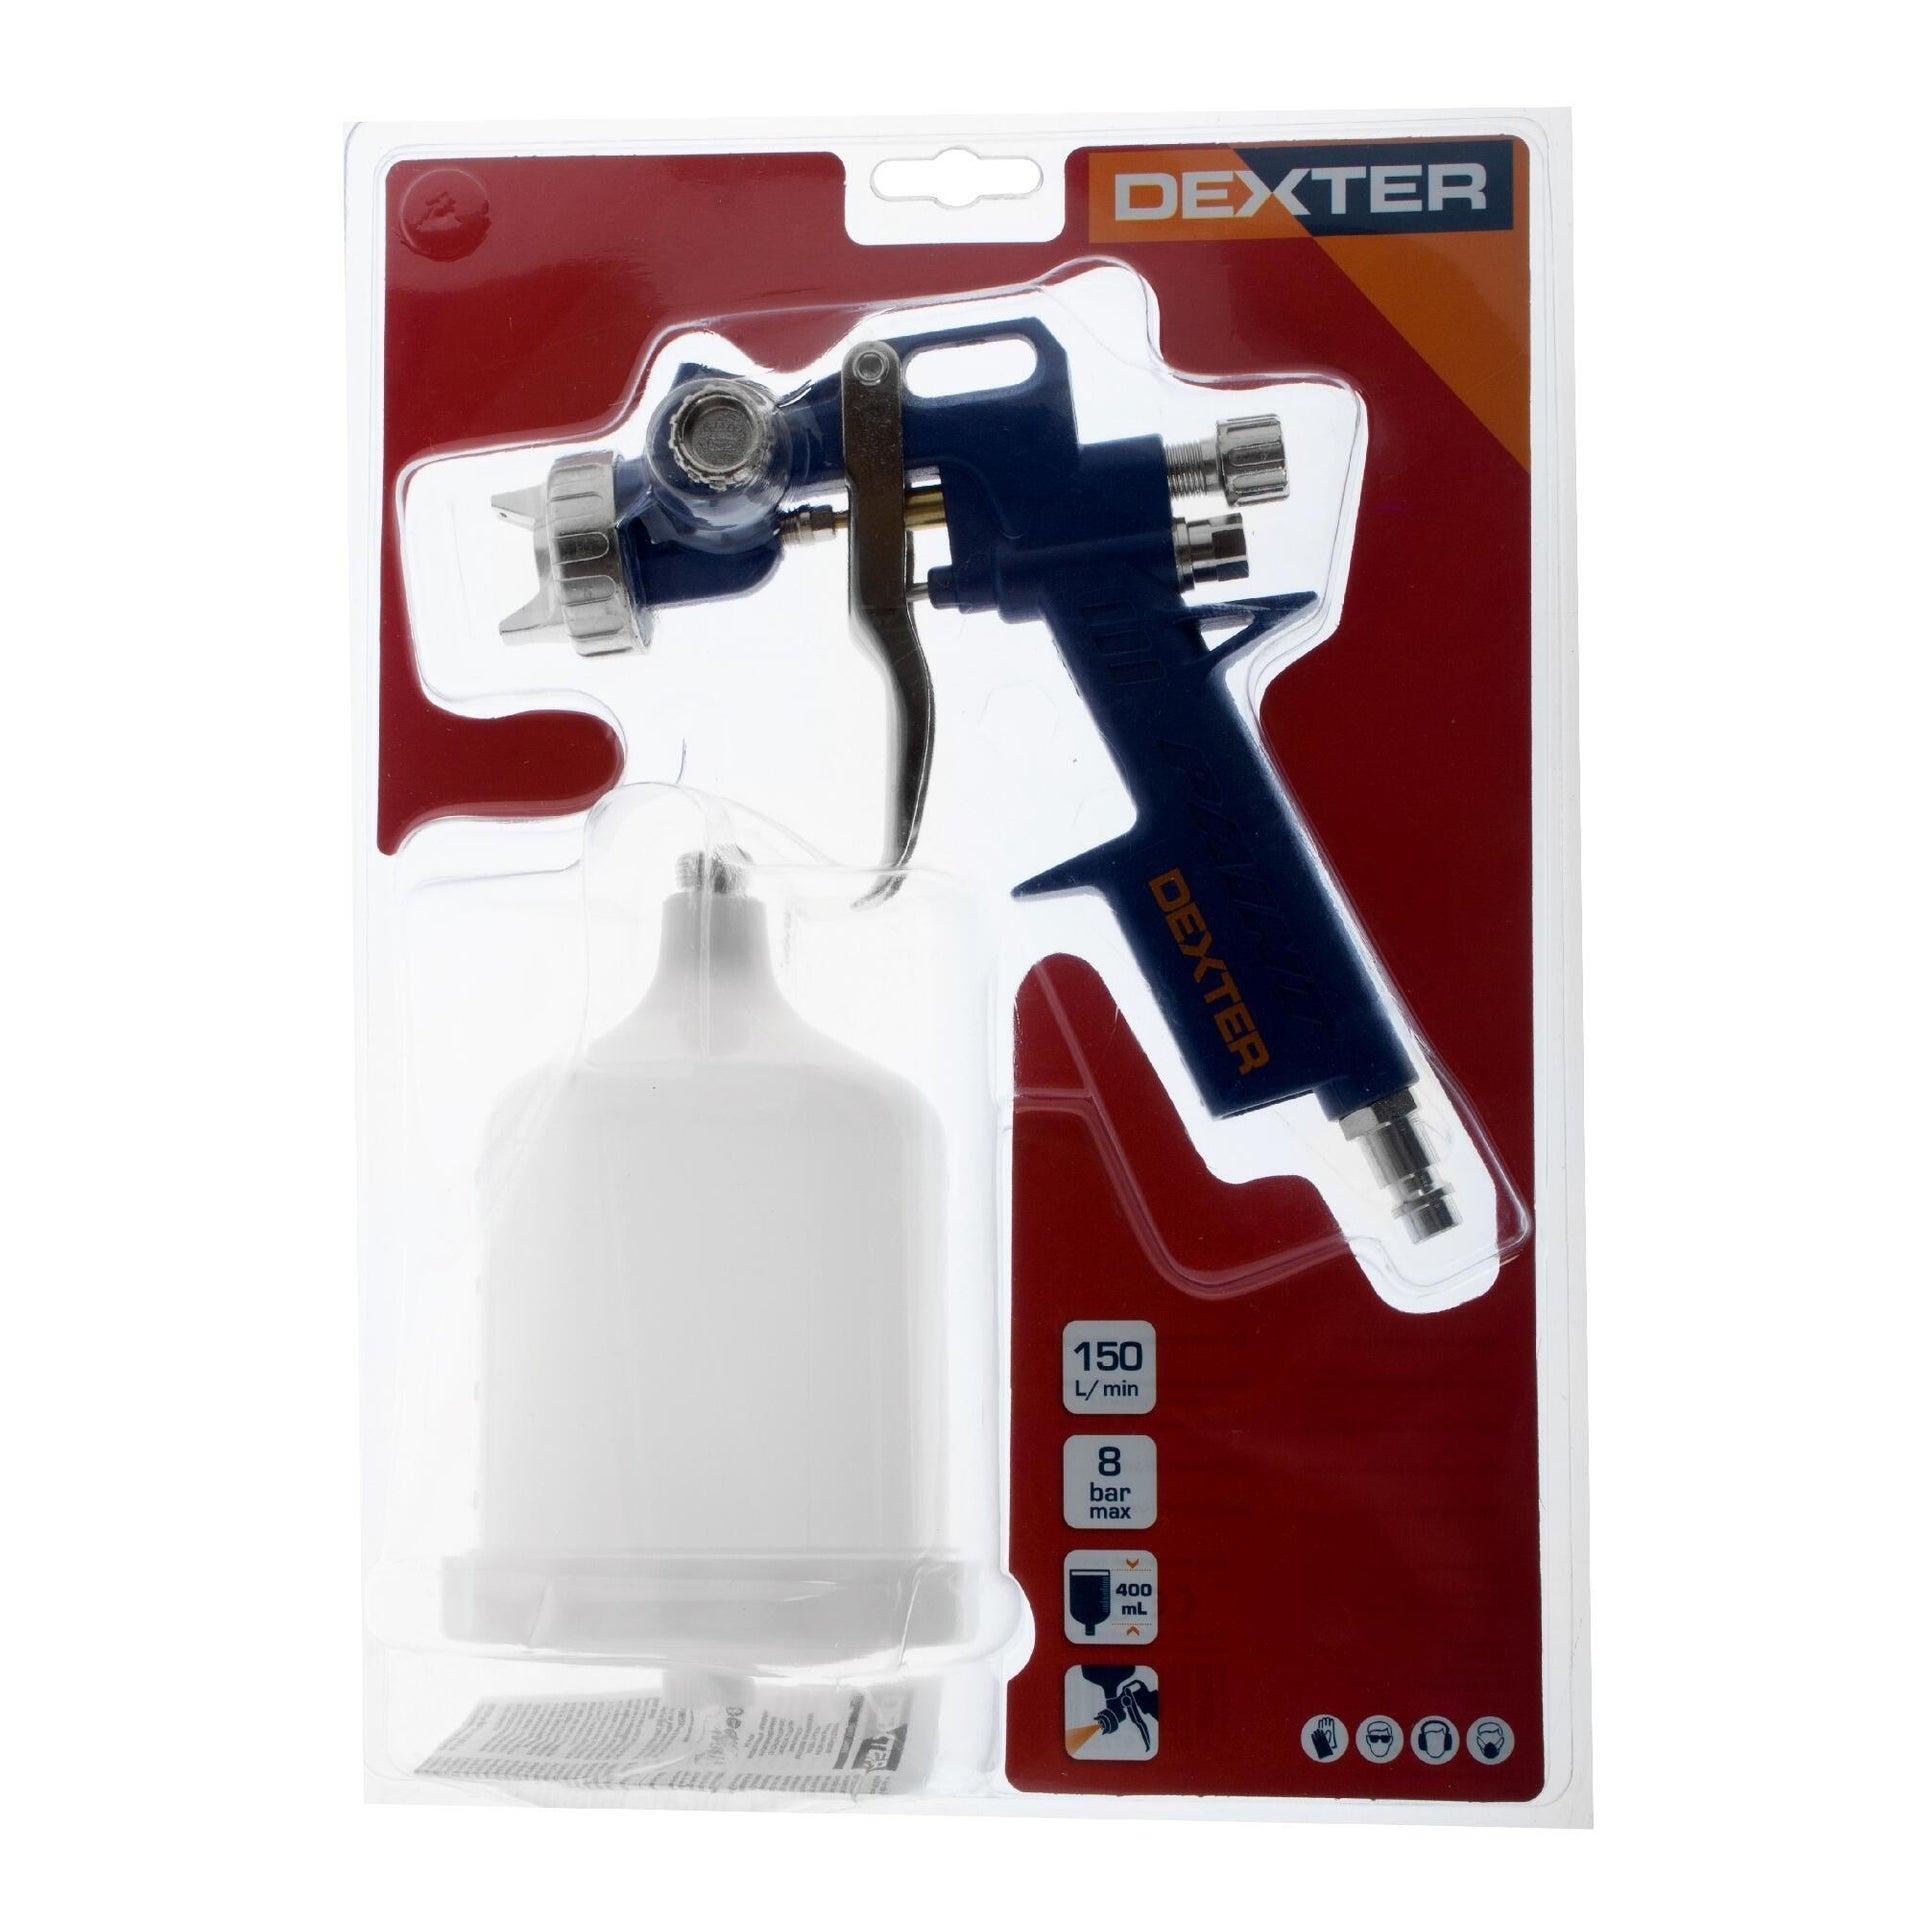 Pistola di verniciatura pneumatica DEXTER 8 bar - 2